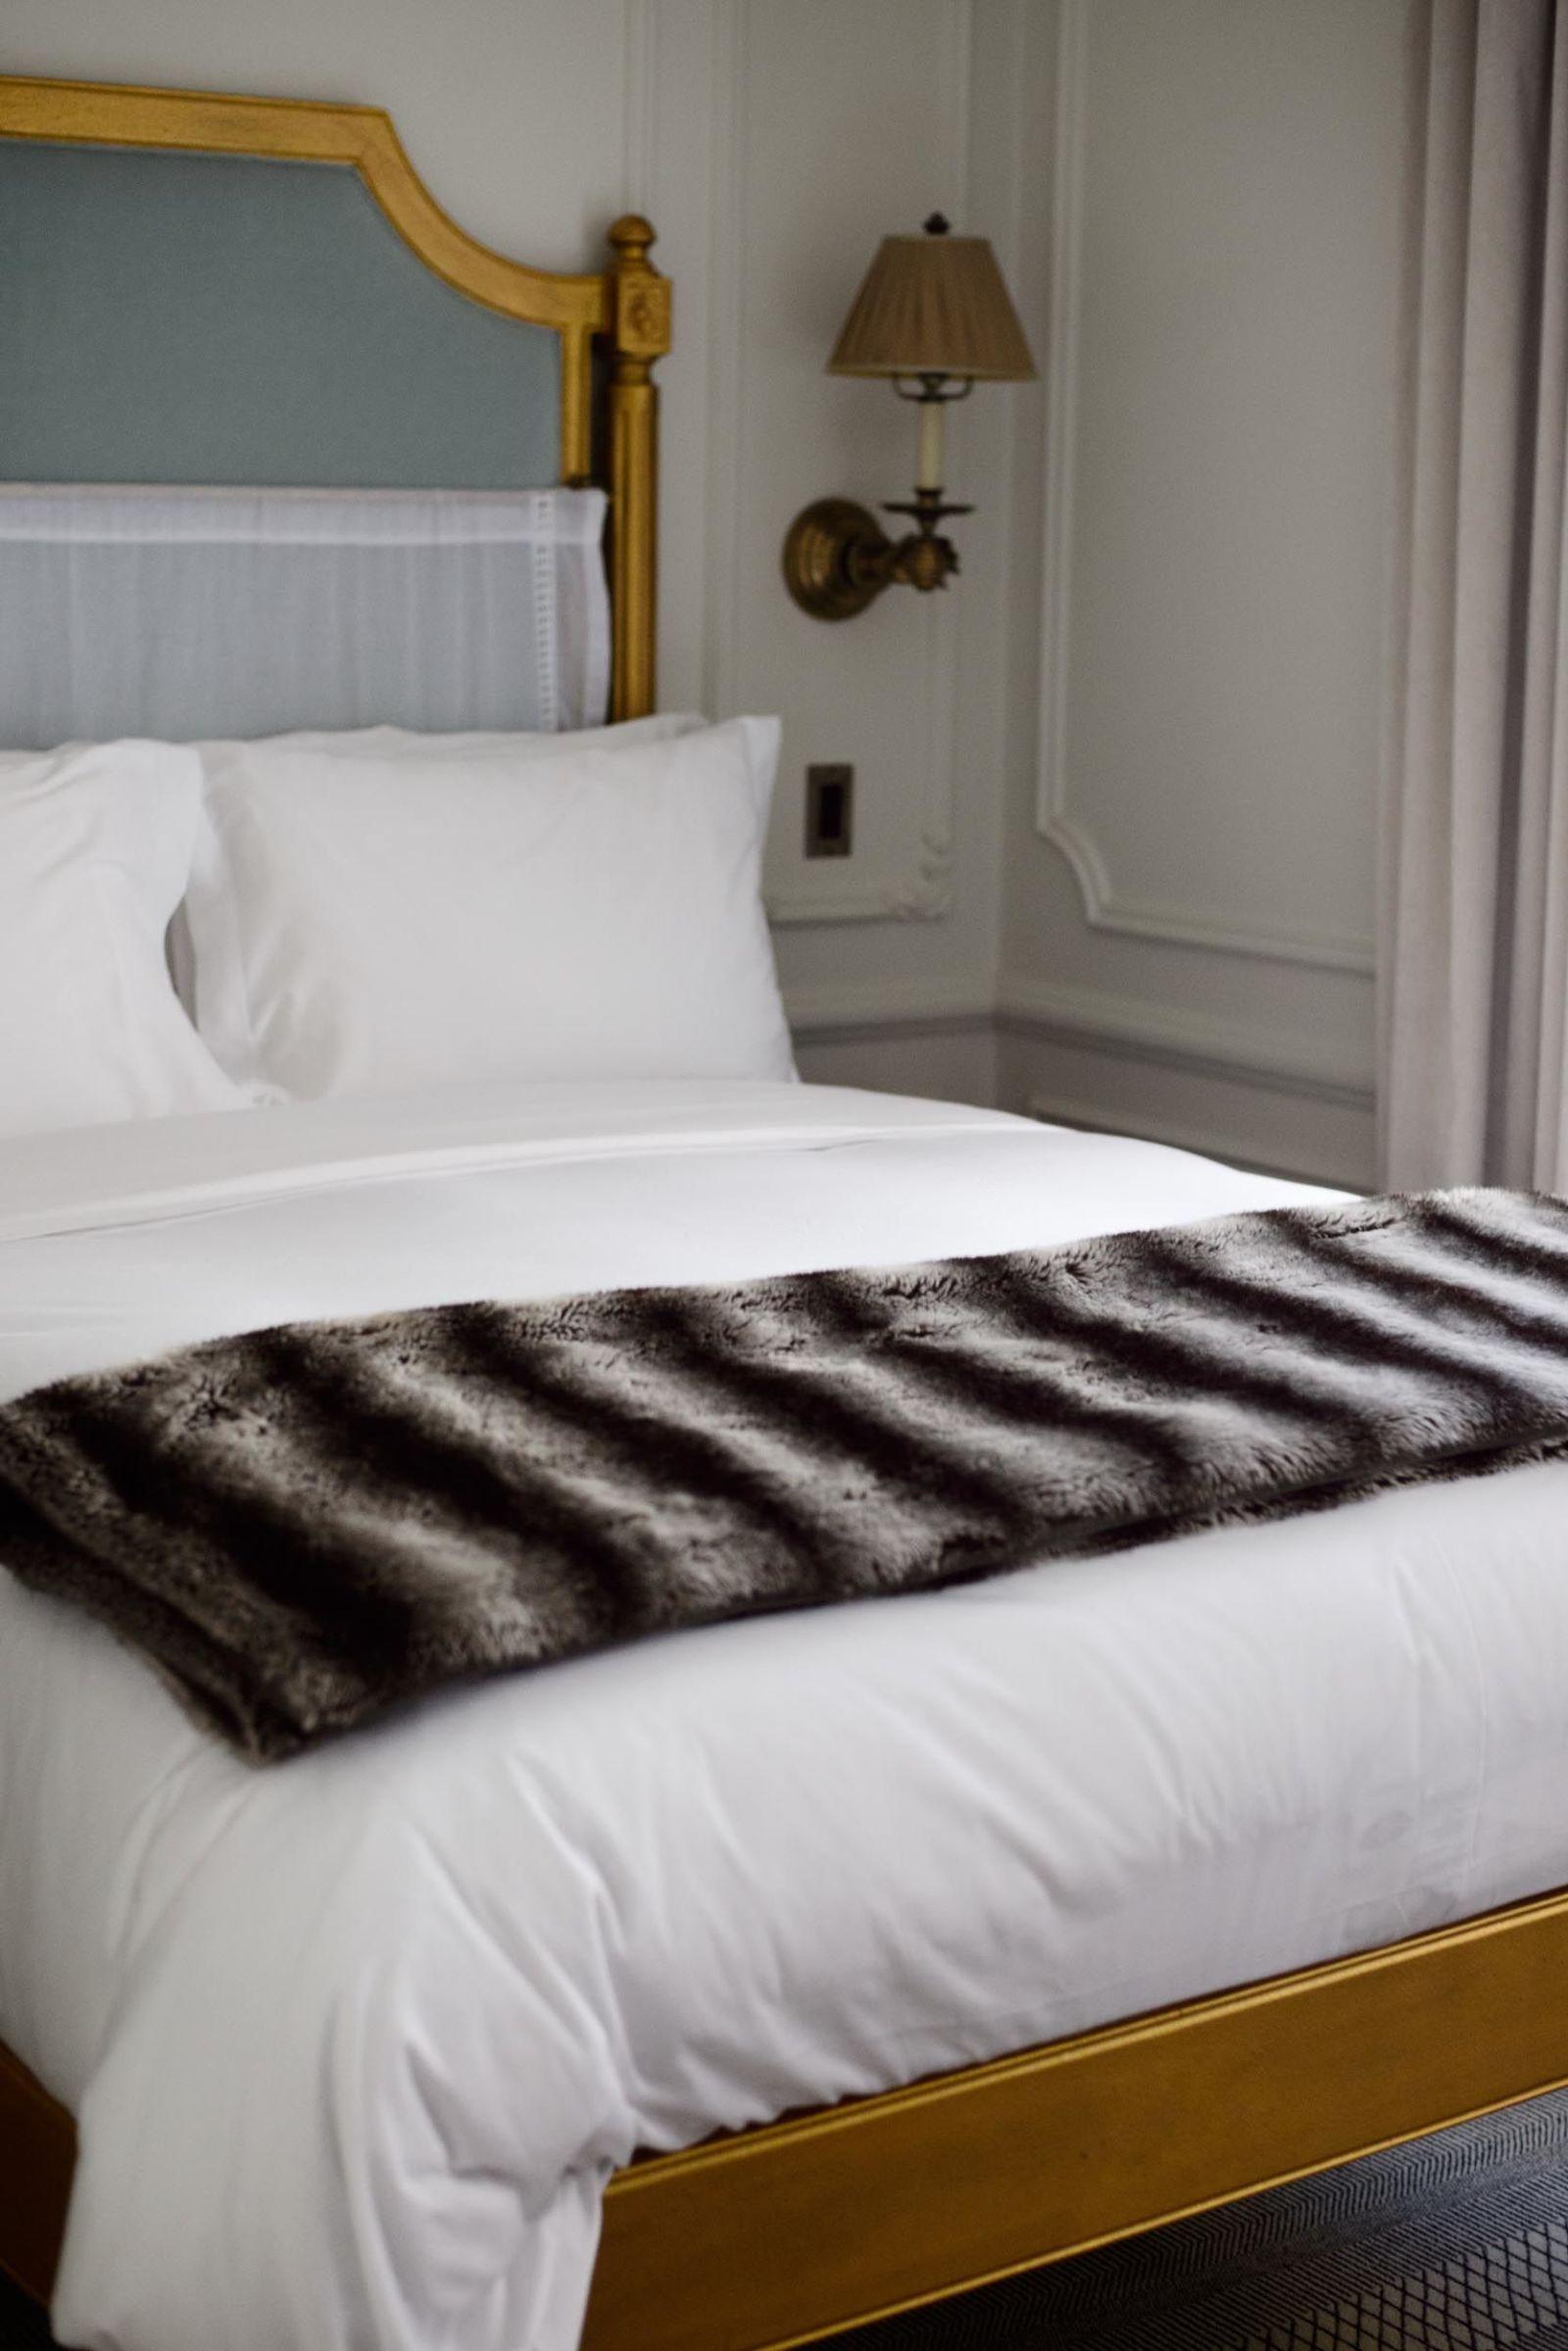 5 Secrets To Making A Bed Like A Hotel Housekeeper How To Make